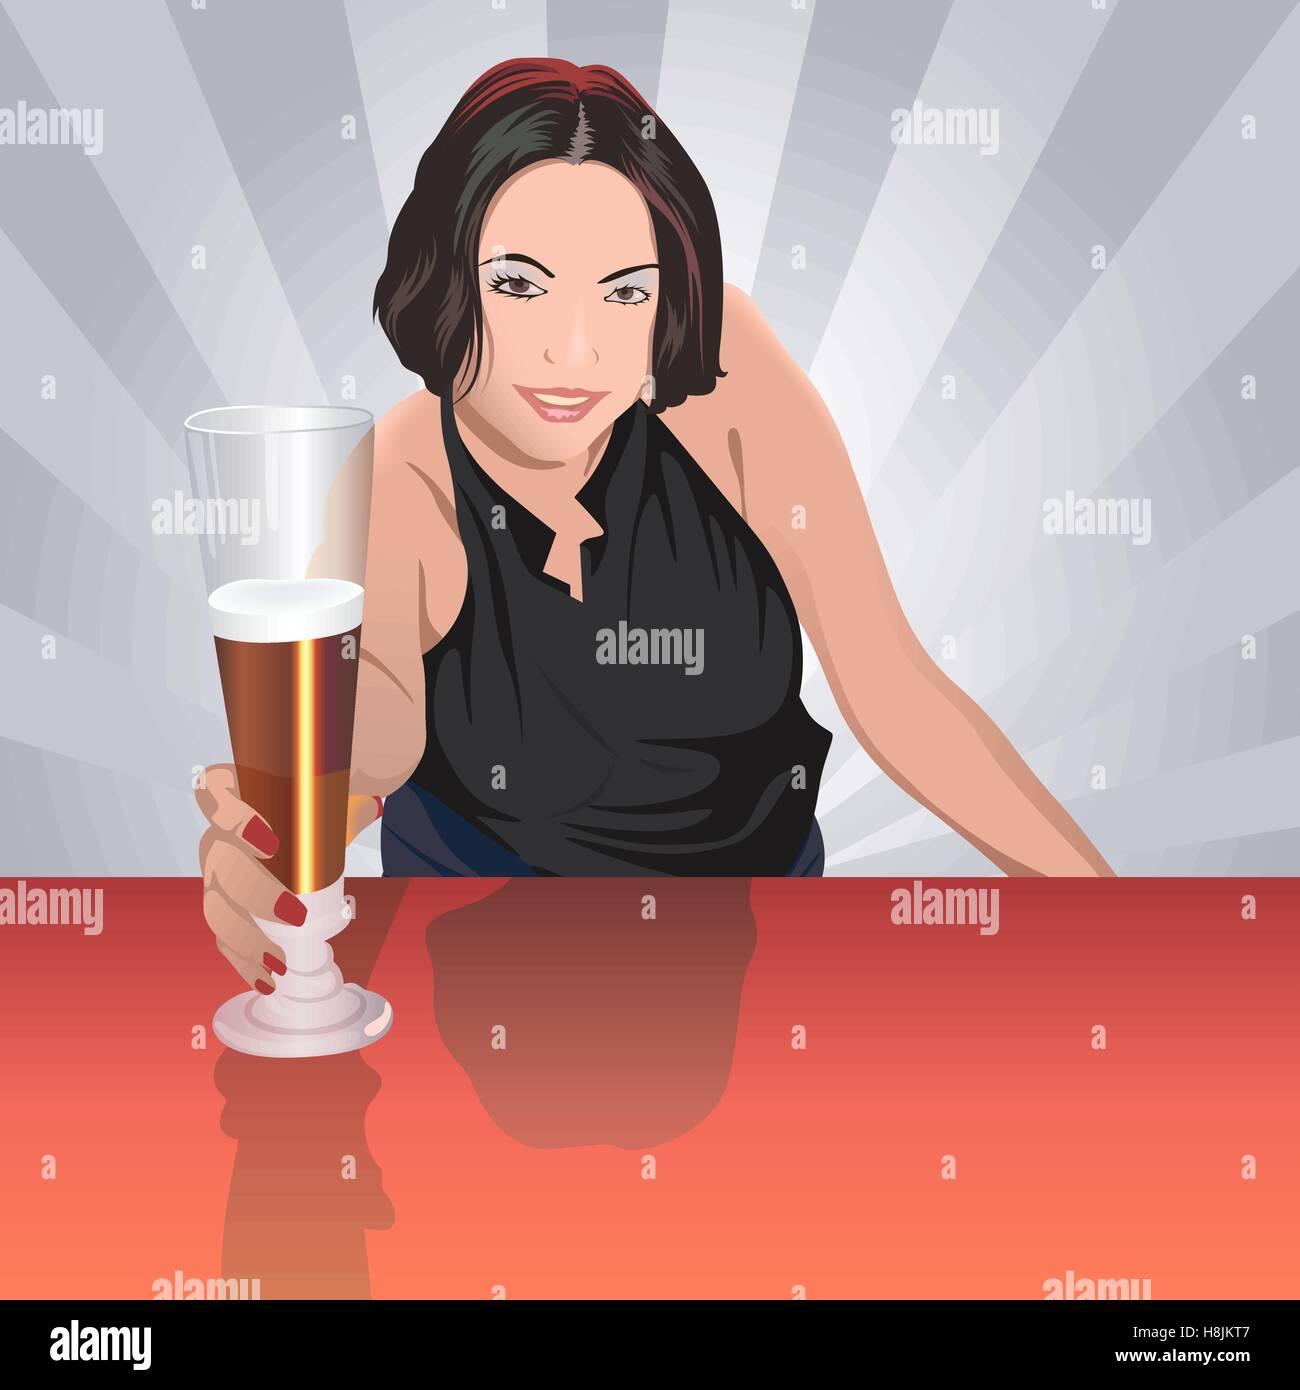 Pretty Barmaid - Stock Vector